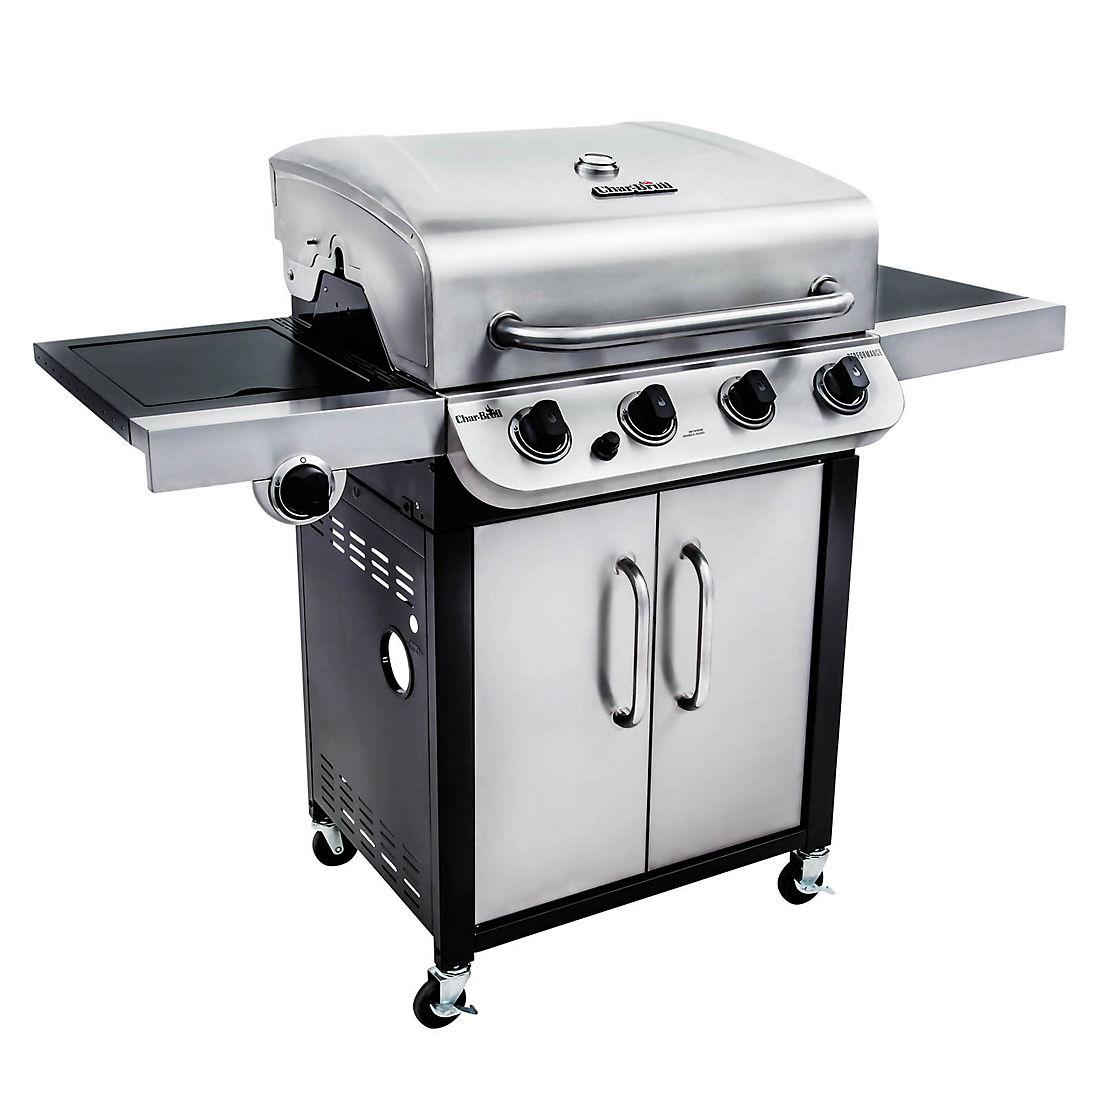 Char-broil stainless steel performance 4-burner gas grill bjs.